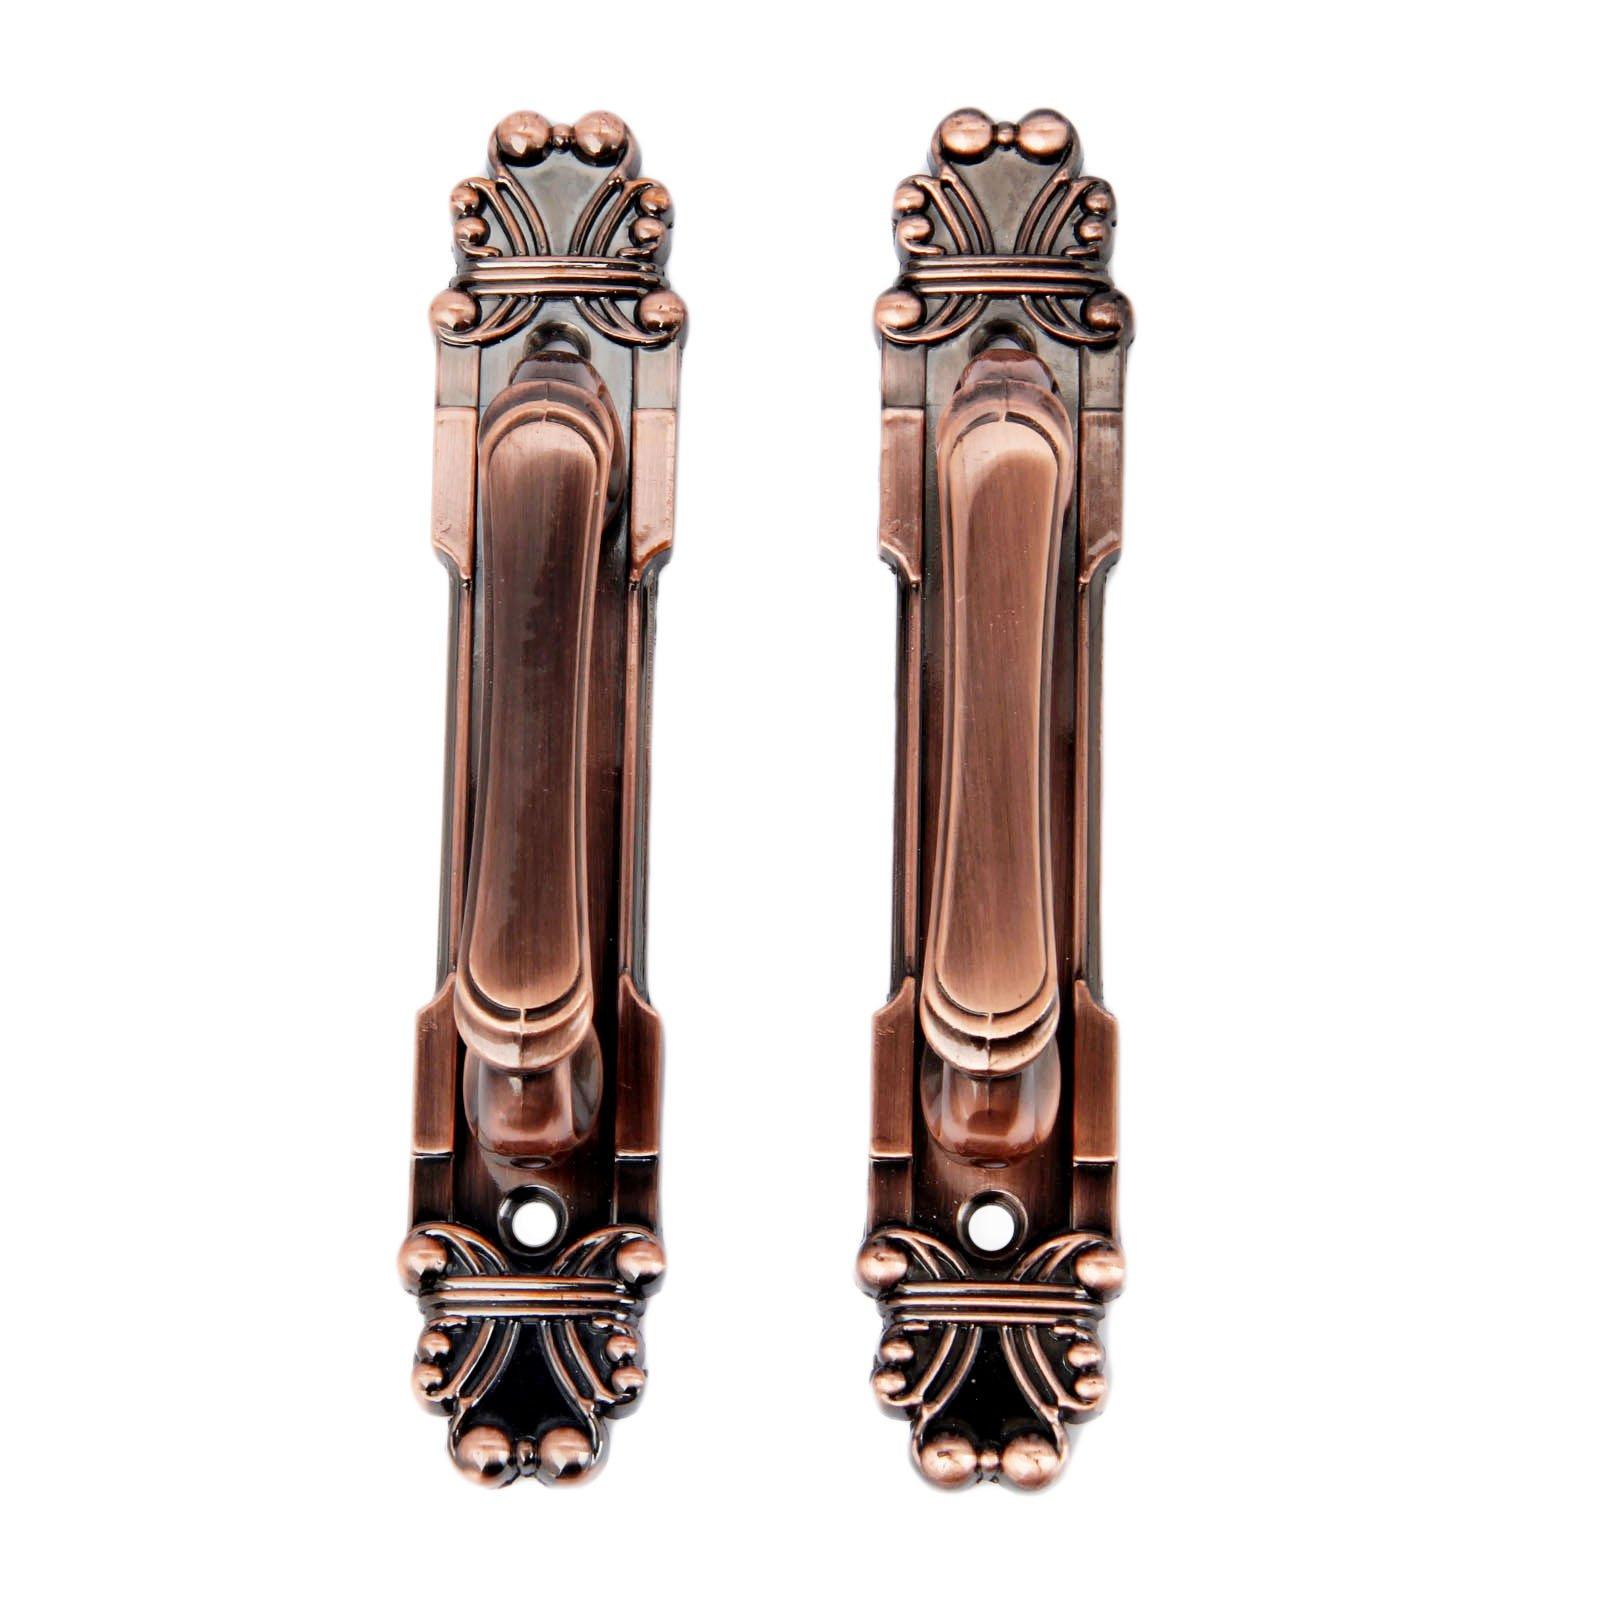 10Pcs 165mm European Style Vintage Brass Metal Knobs Handles For Home Cabinet Door Drawer Wardrobe Cupboard Red Bronze